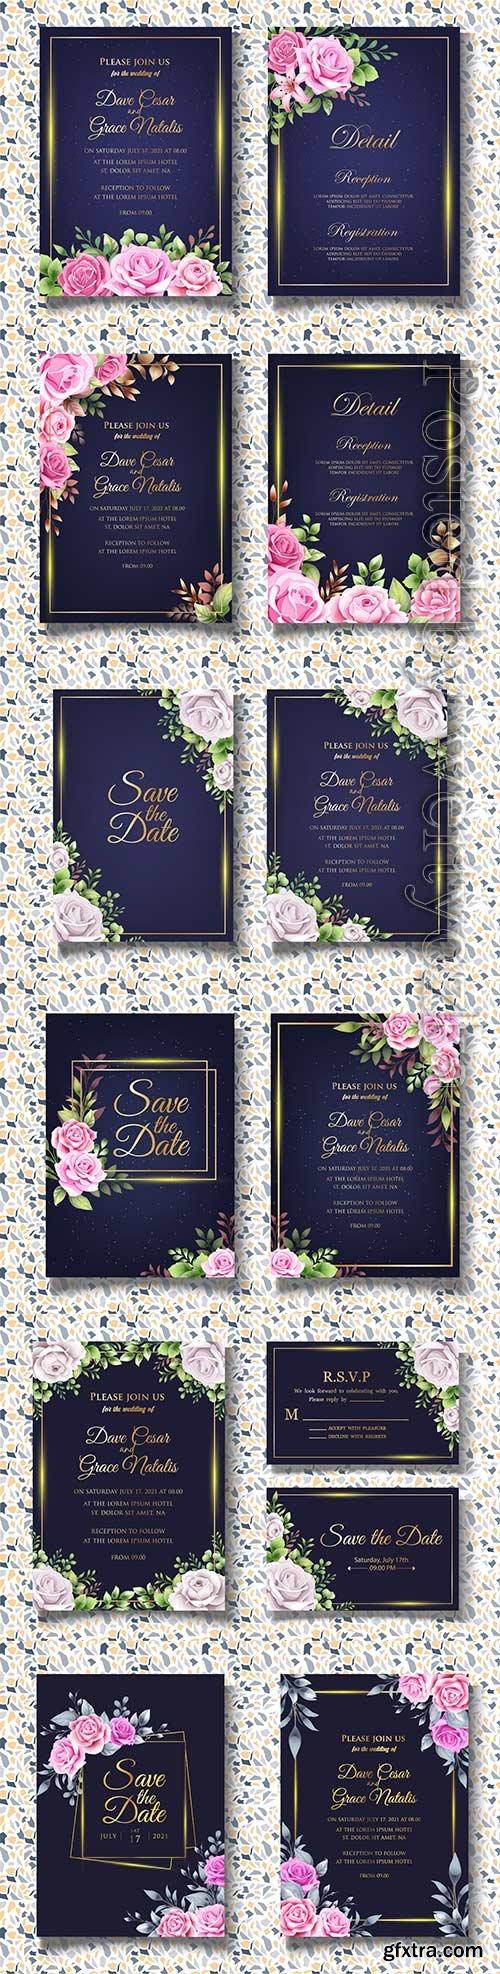 Floral wedding invitation vector template